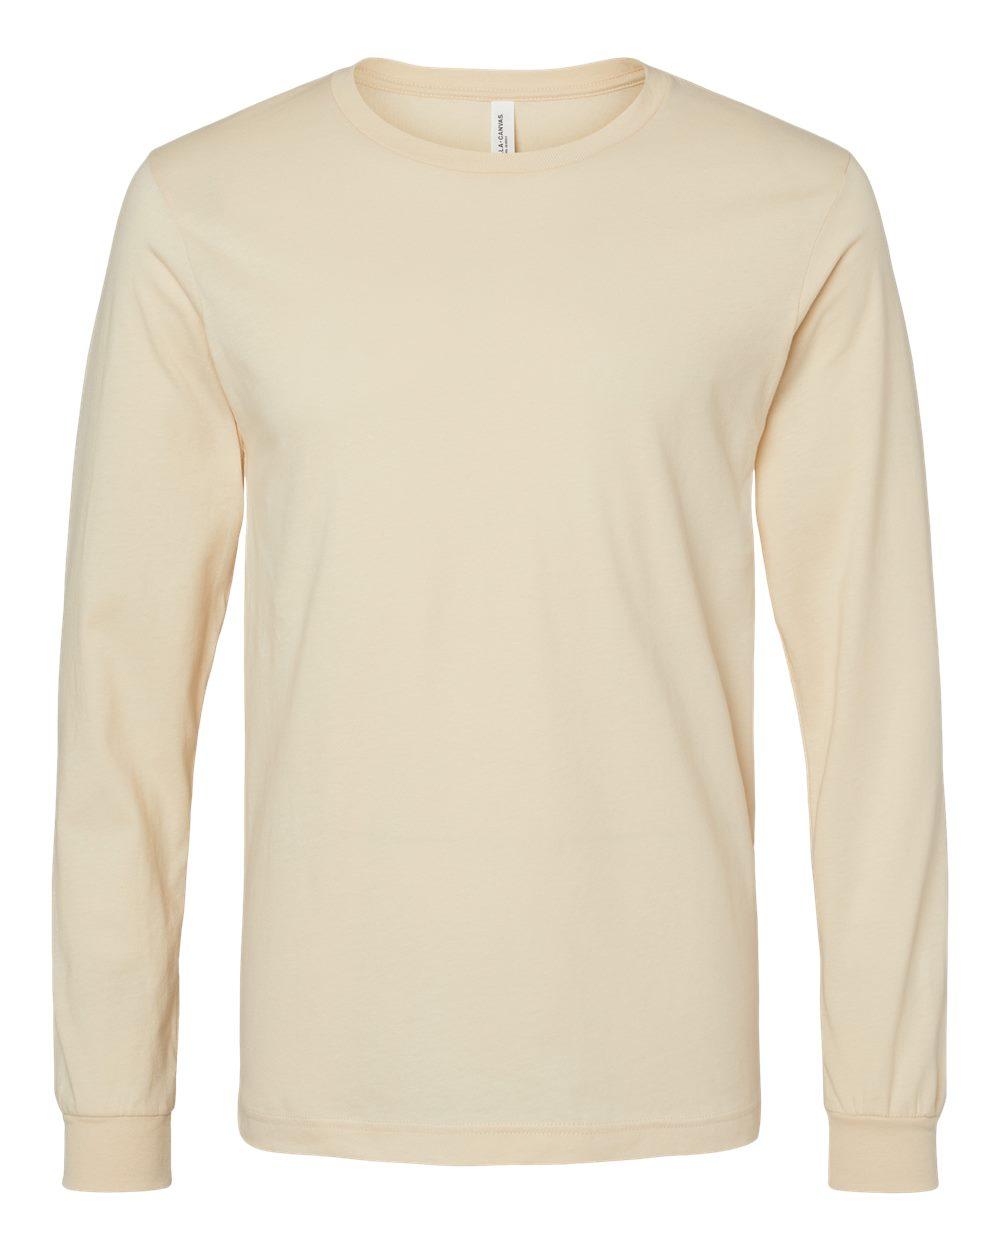 Bella-Canvas-Mens-Blank-Top-Long-Sleeve-Jersey-Tee-T-Shirt-3501-up-to-3XL thumbnail 52